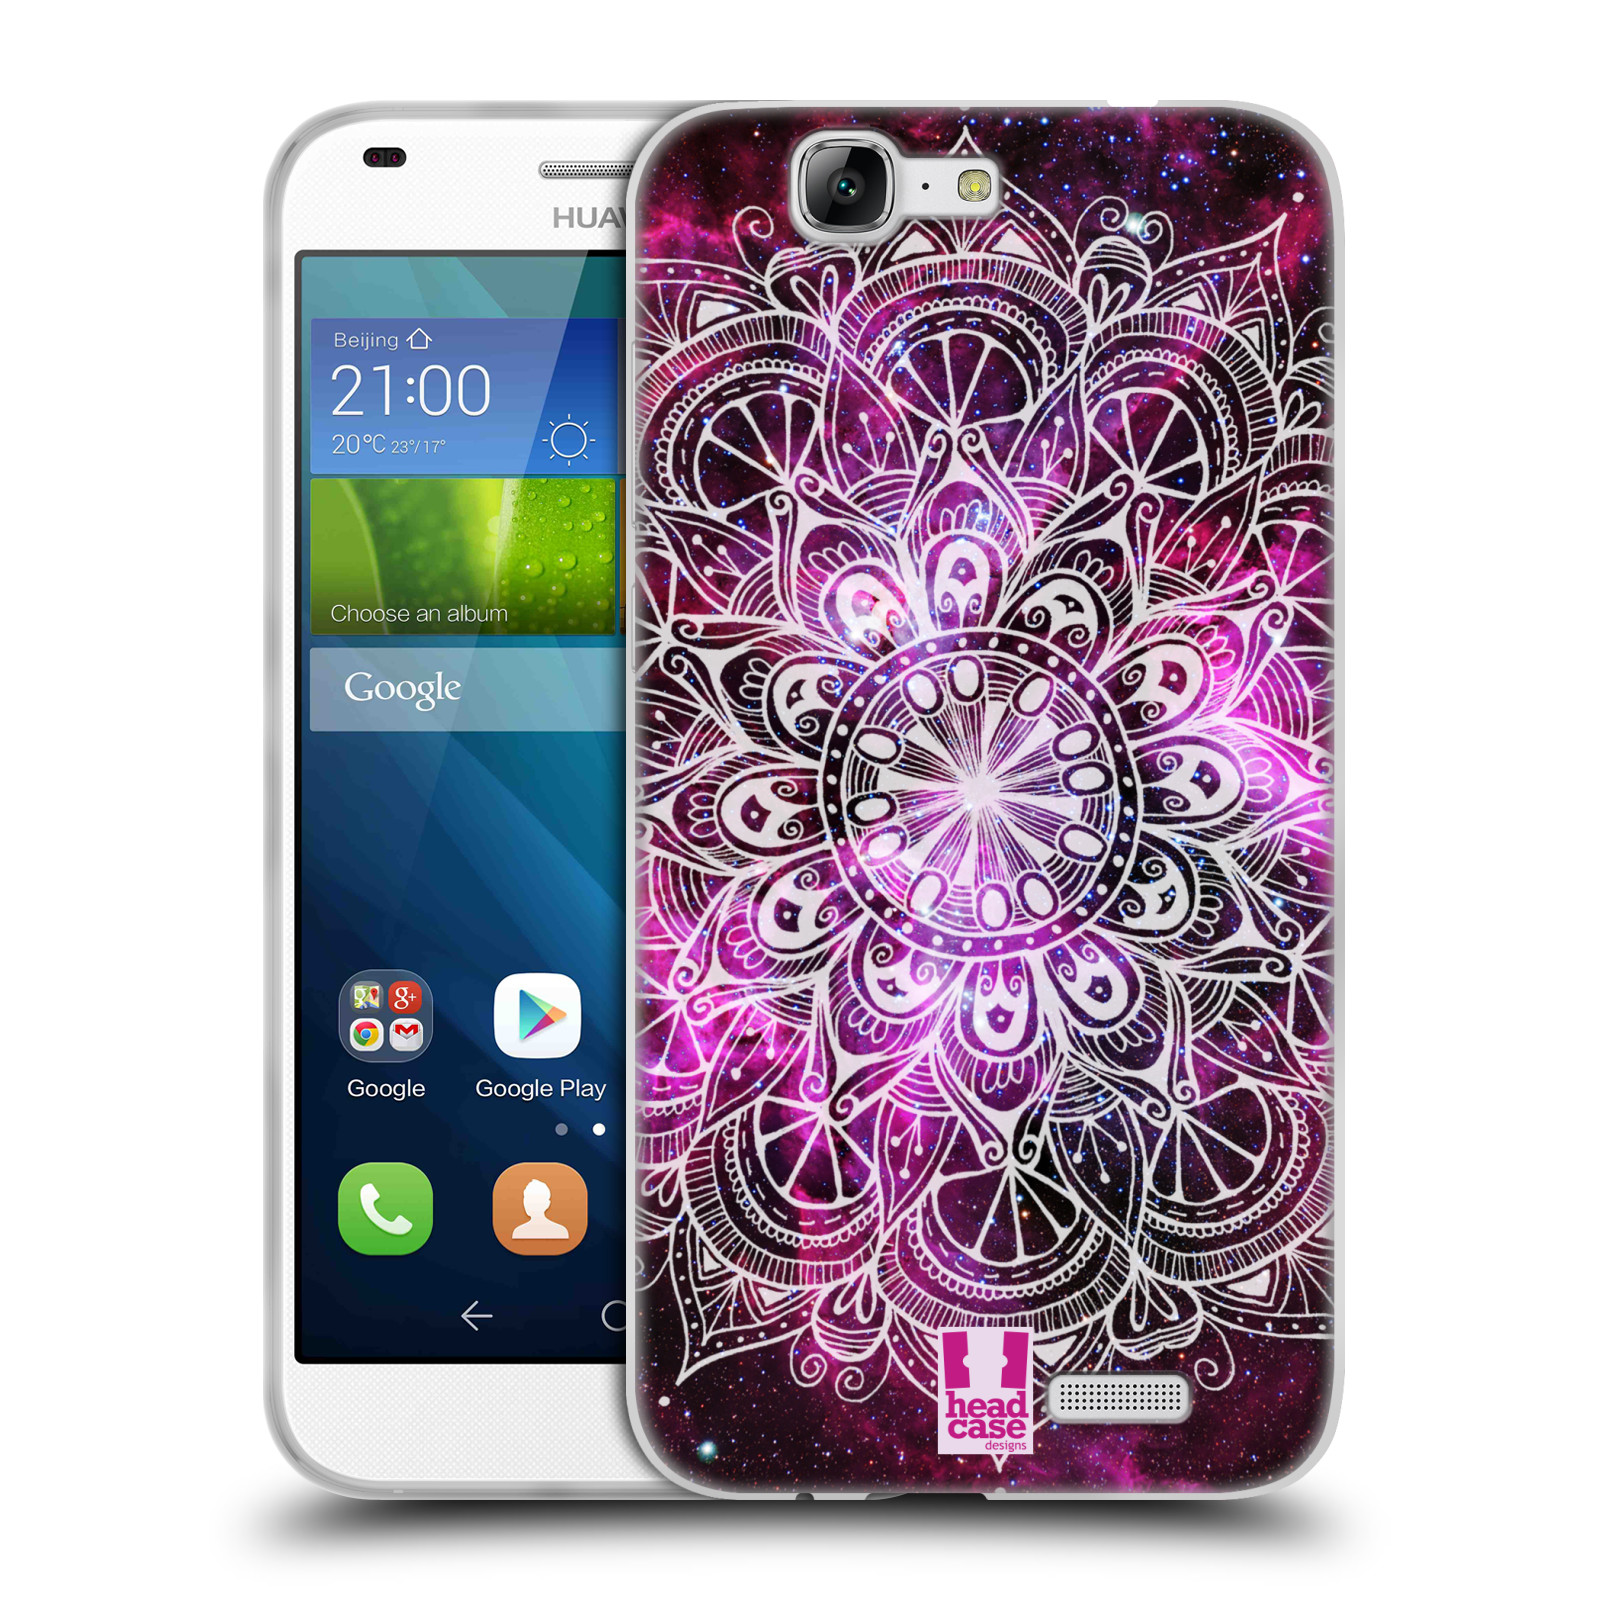 Silikonové pouzdro na mobil Huawei Ascend G7 HEAD CASE Mandala Doodle Nebula